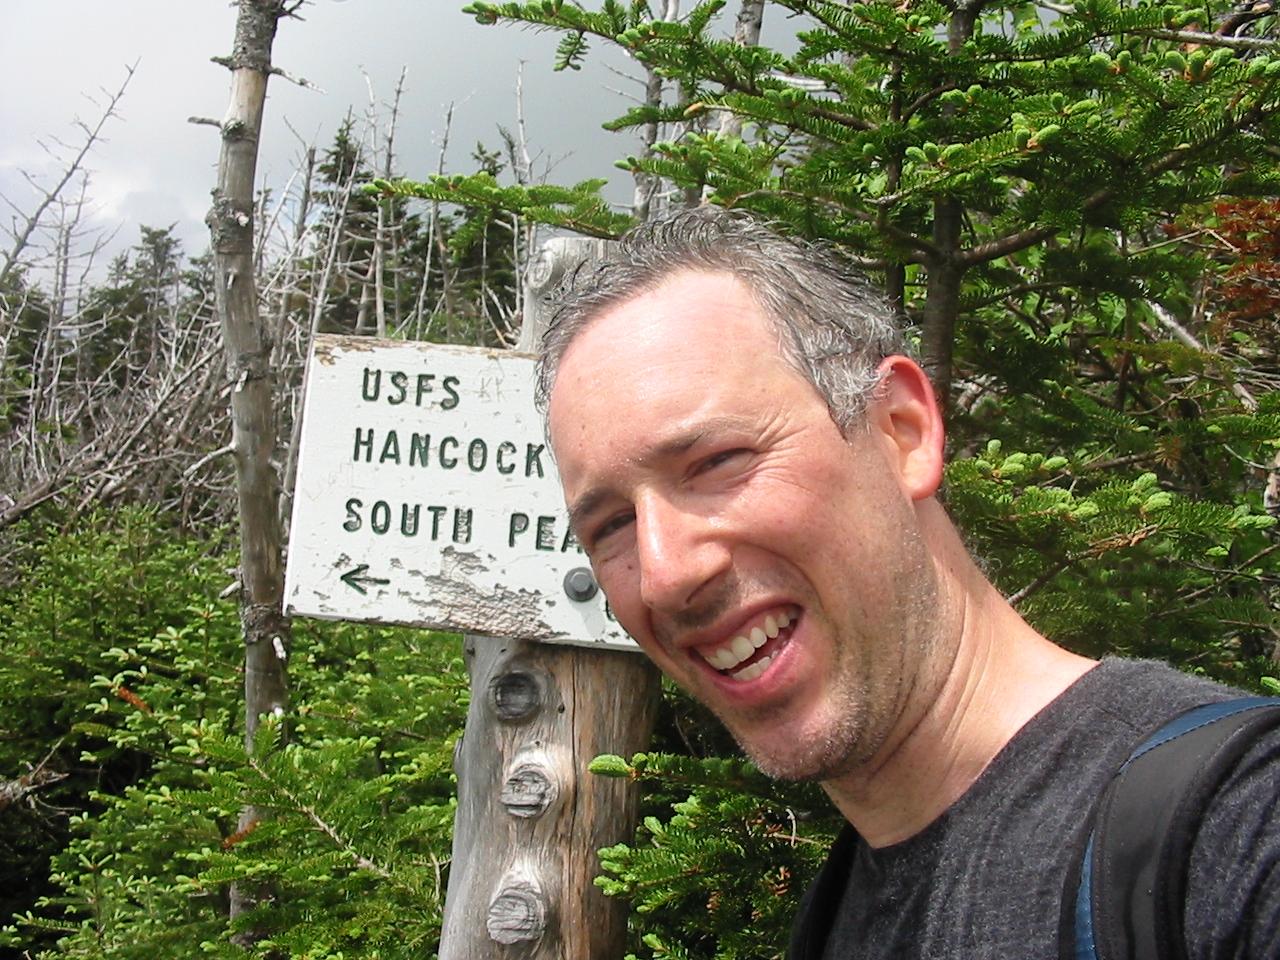 North Hancock Summit